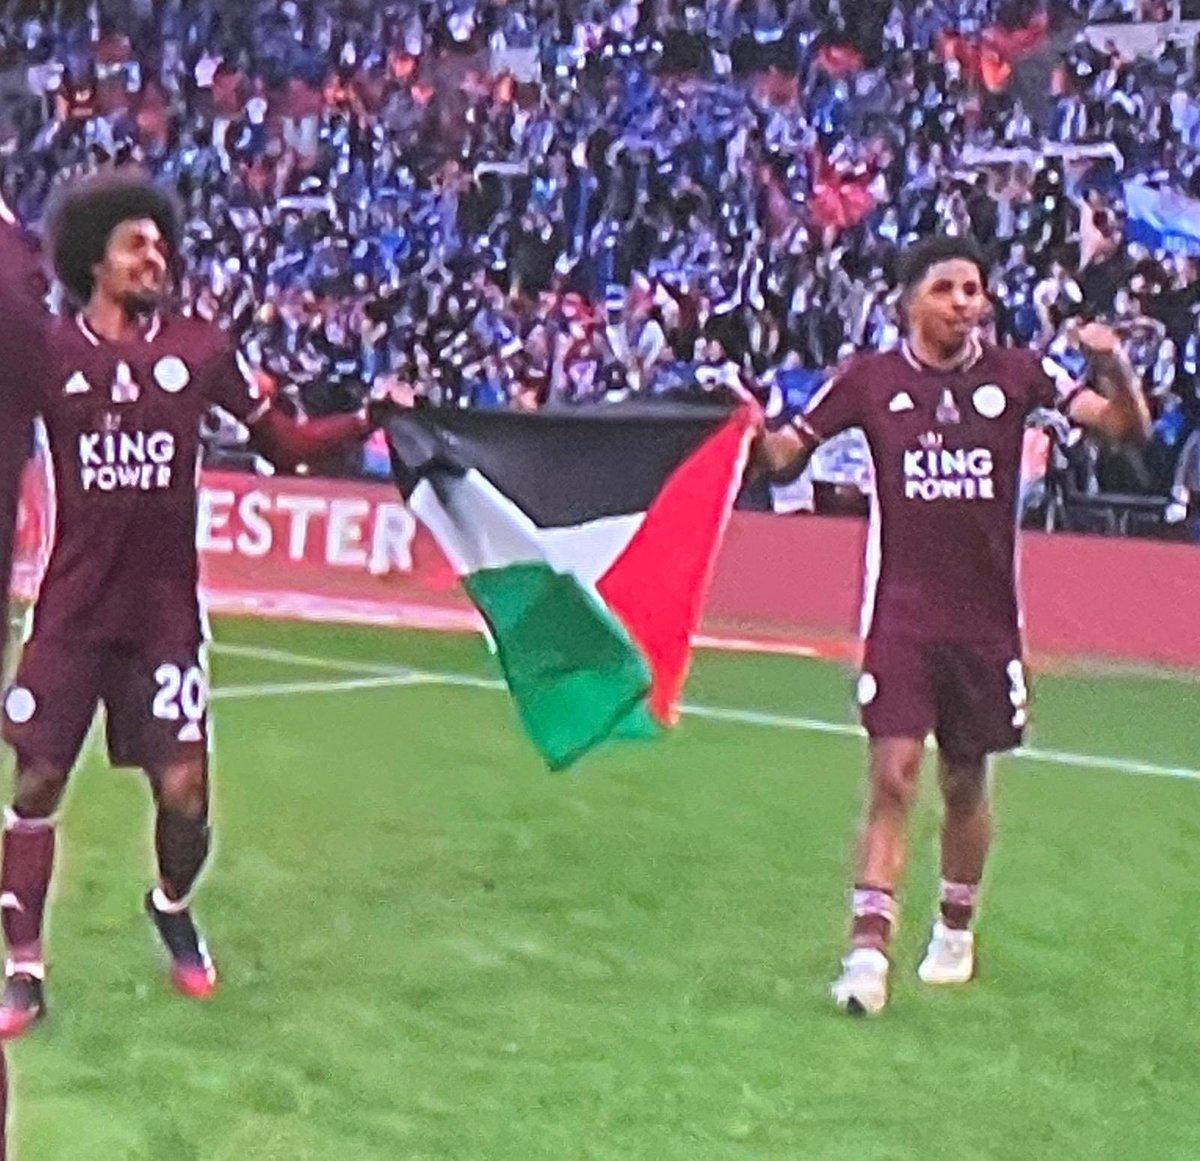 The FA needs to act immediately to discipline them https://t.co/iqahEIxxF6